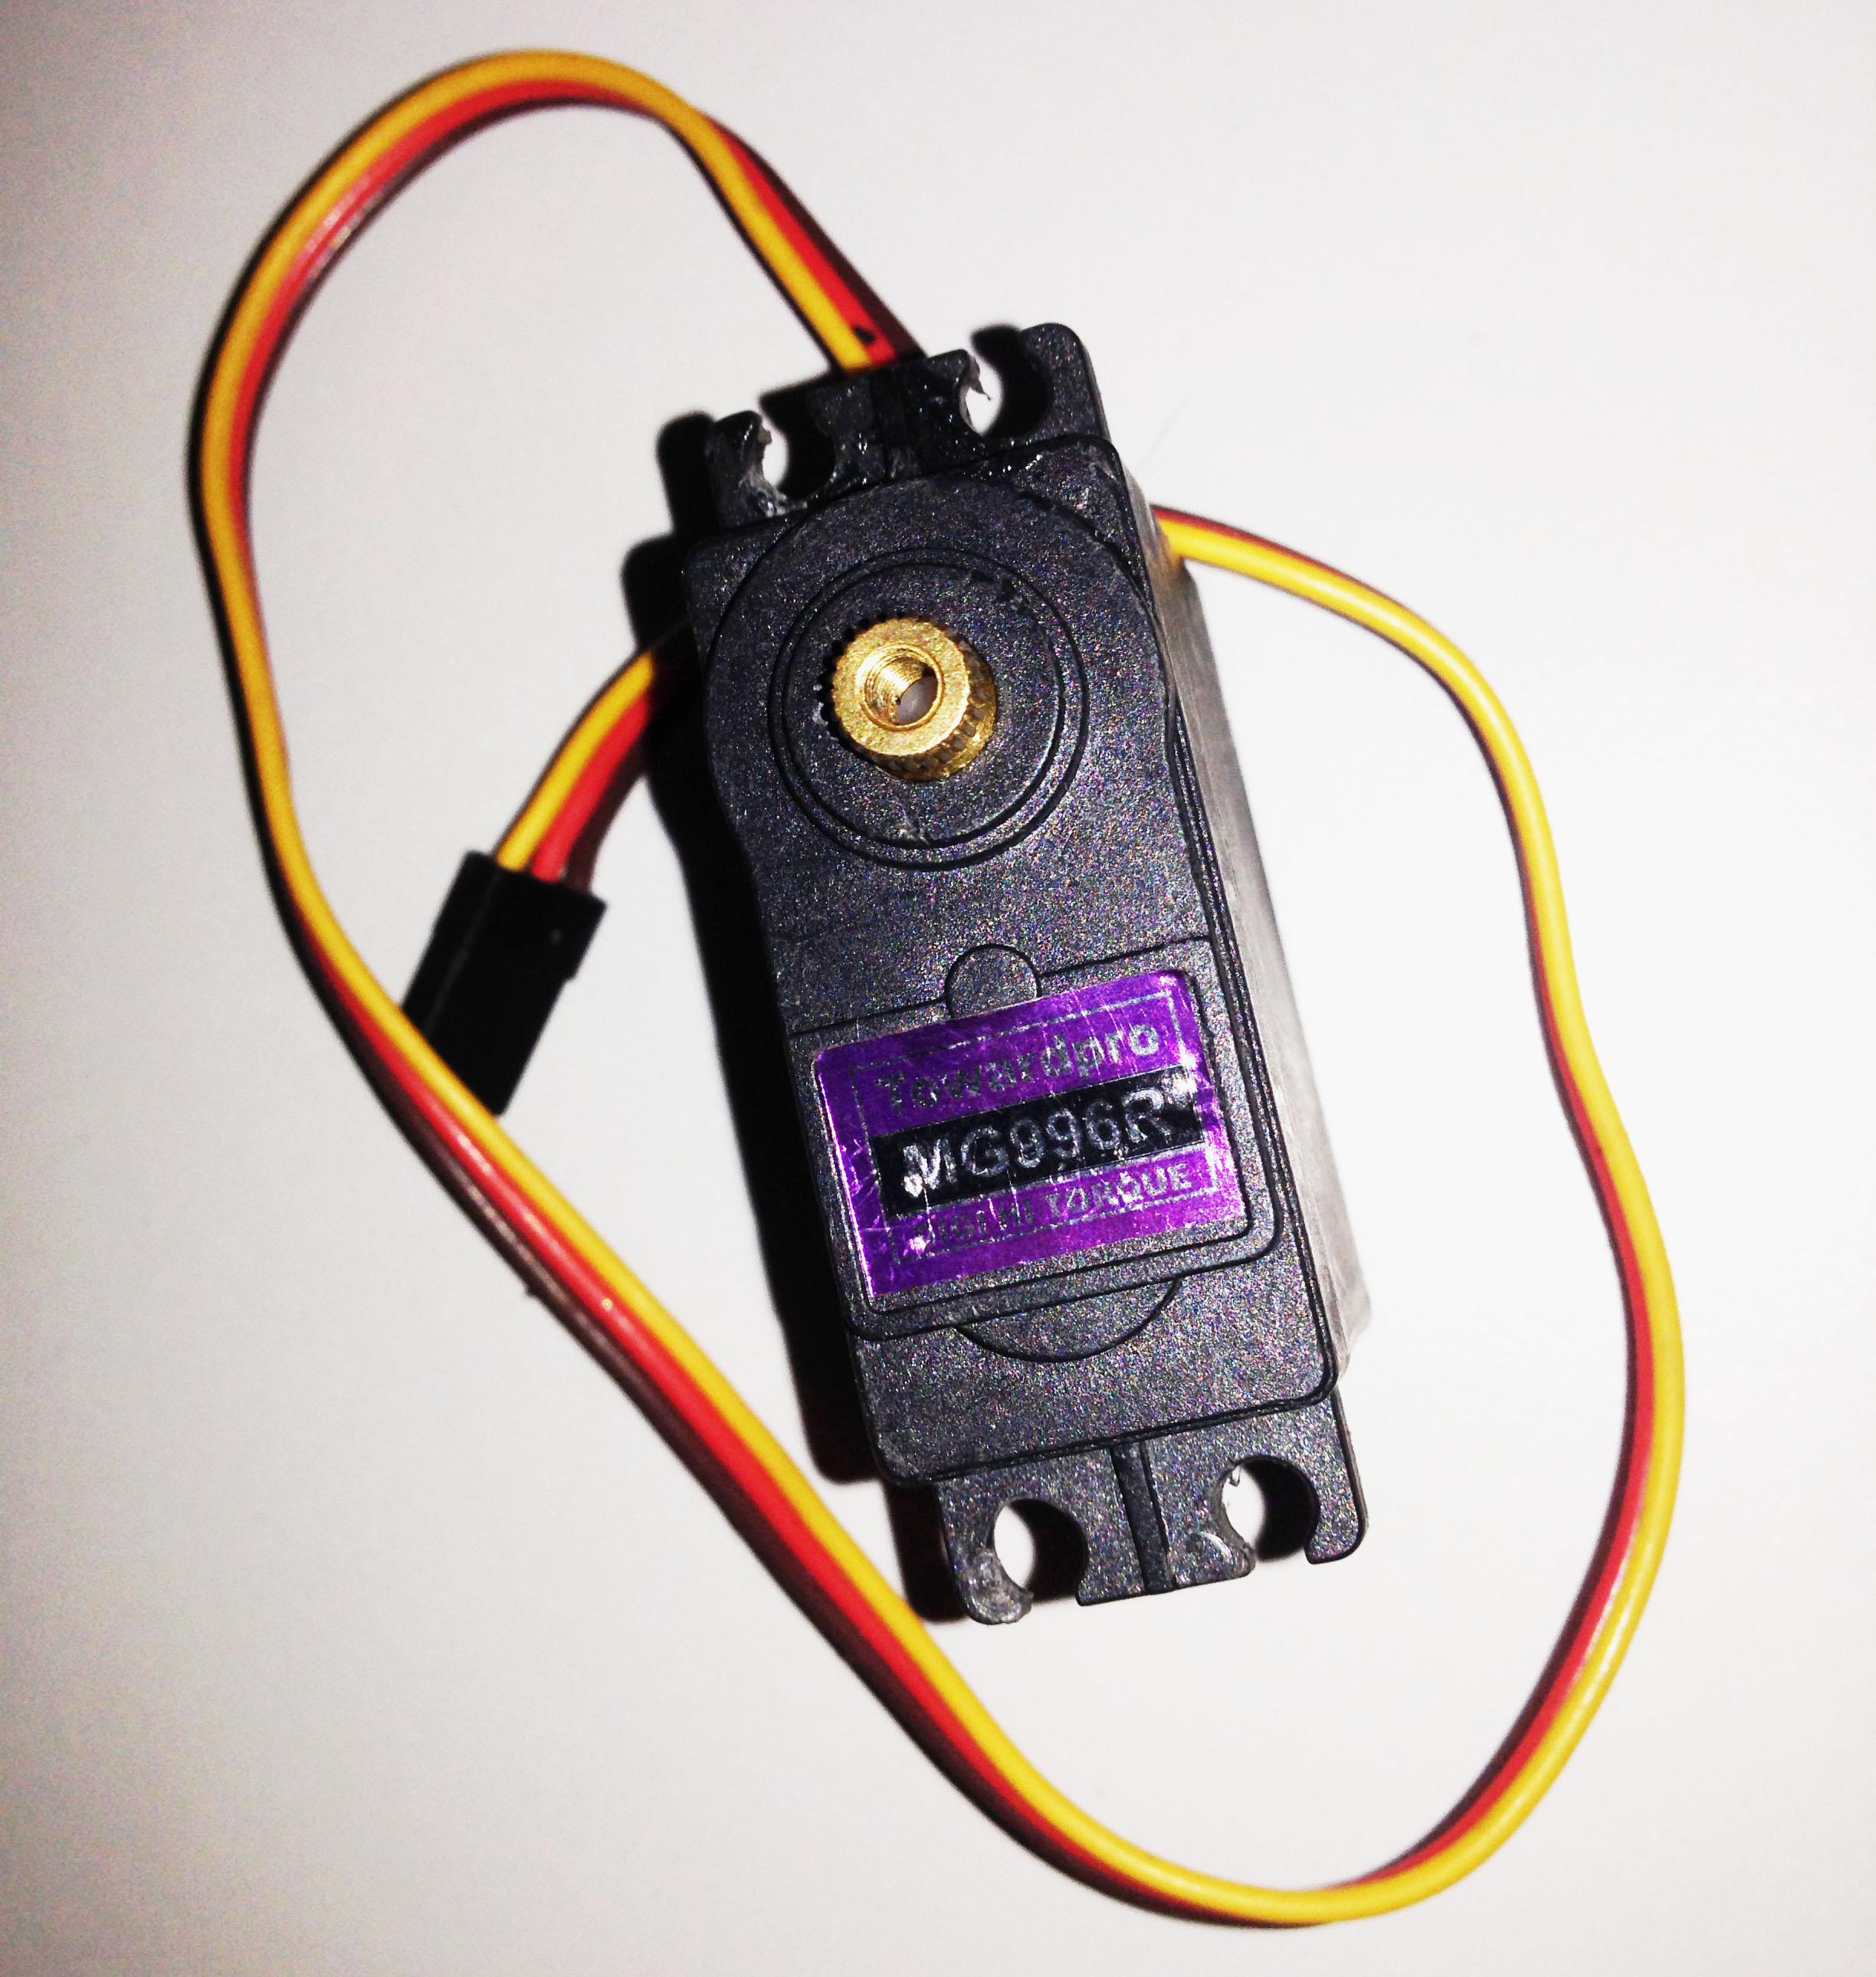 Mg996r Servo Wiring Diagram Schematic Connecting A Motor To An Arduino Plug